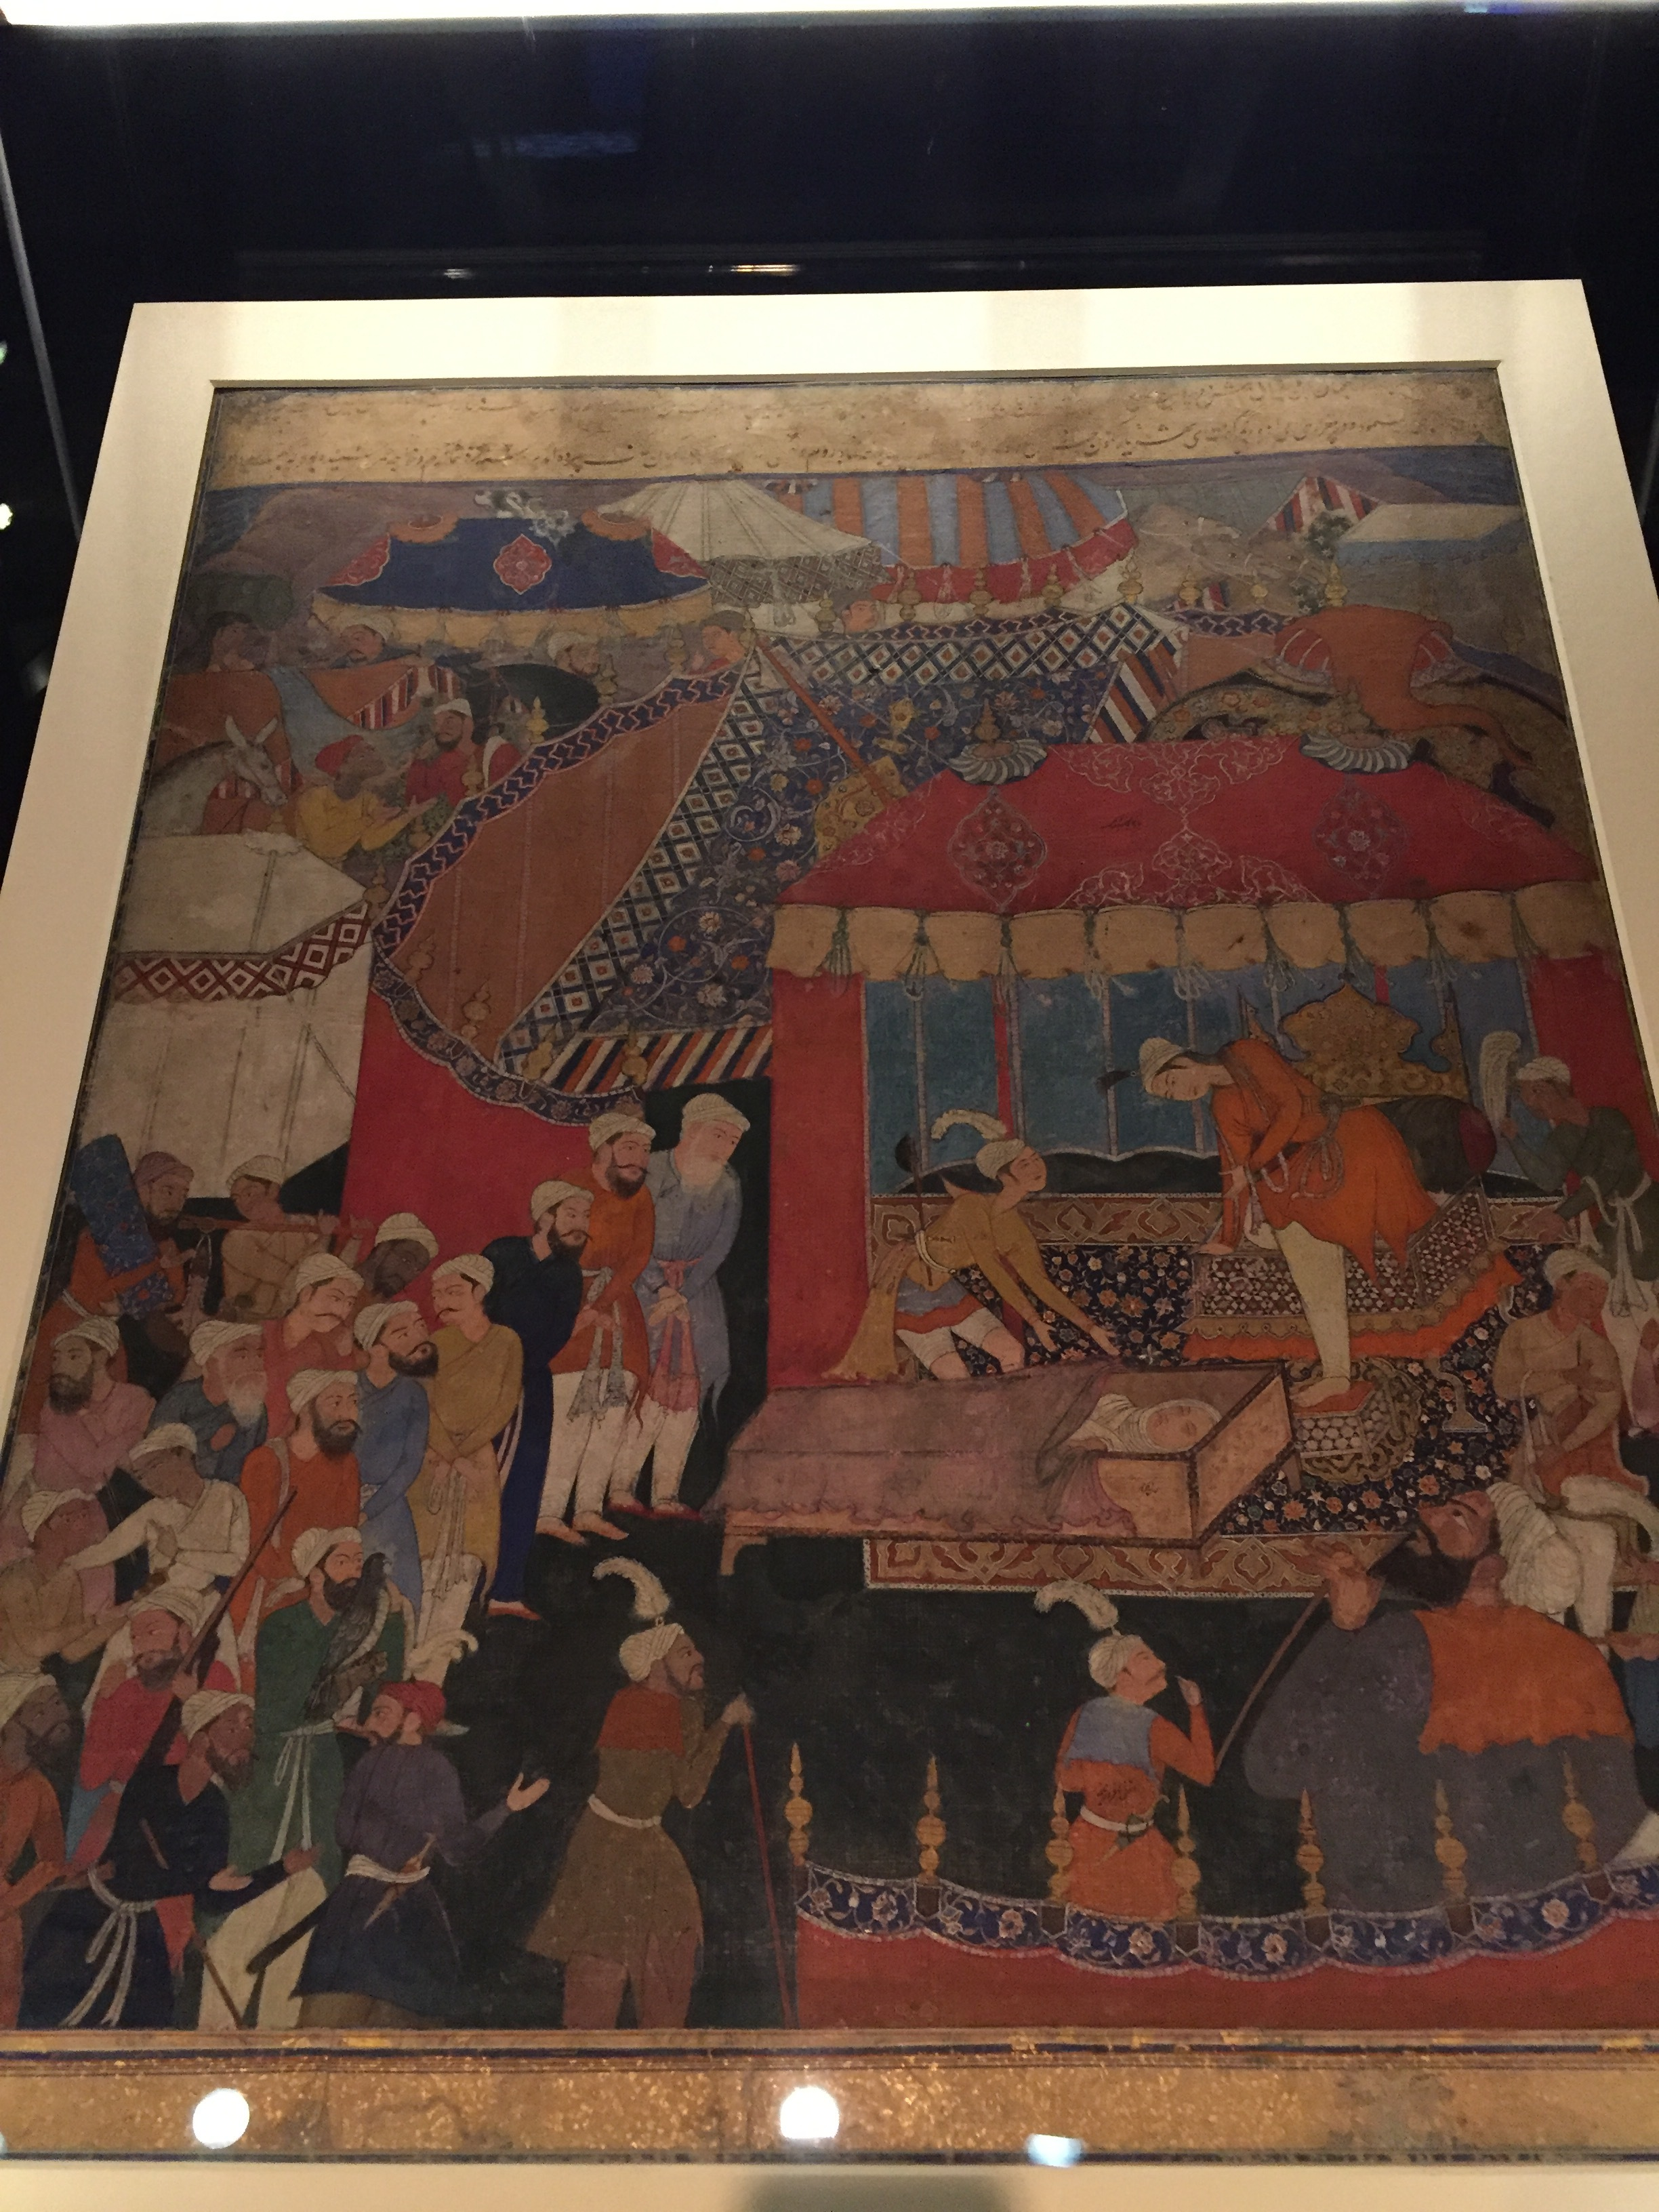 Old battle scenes from Quranic scripture.